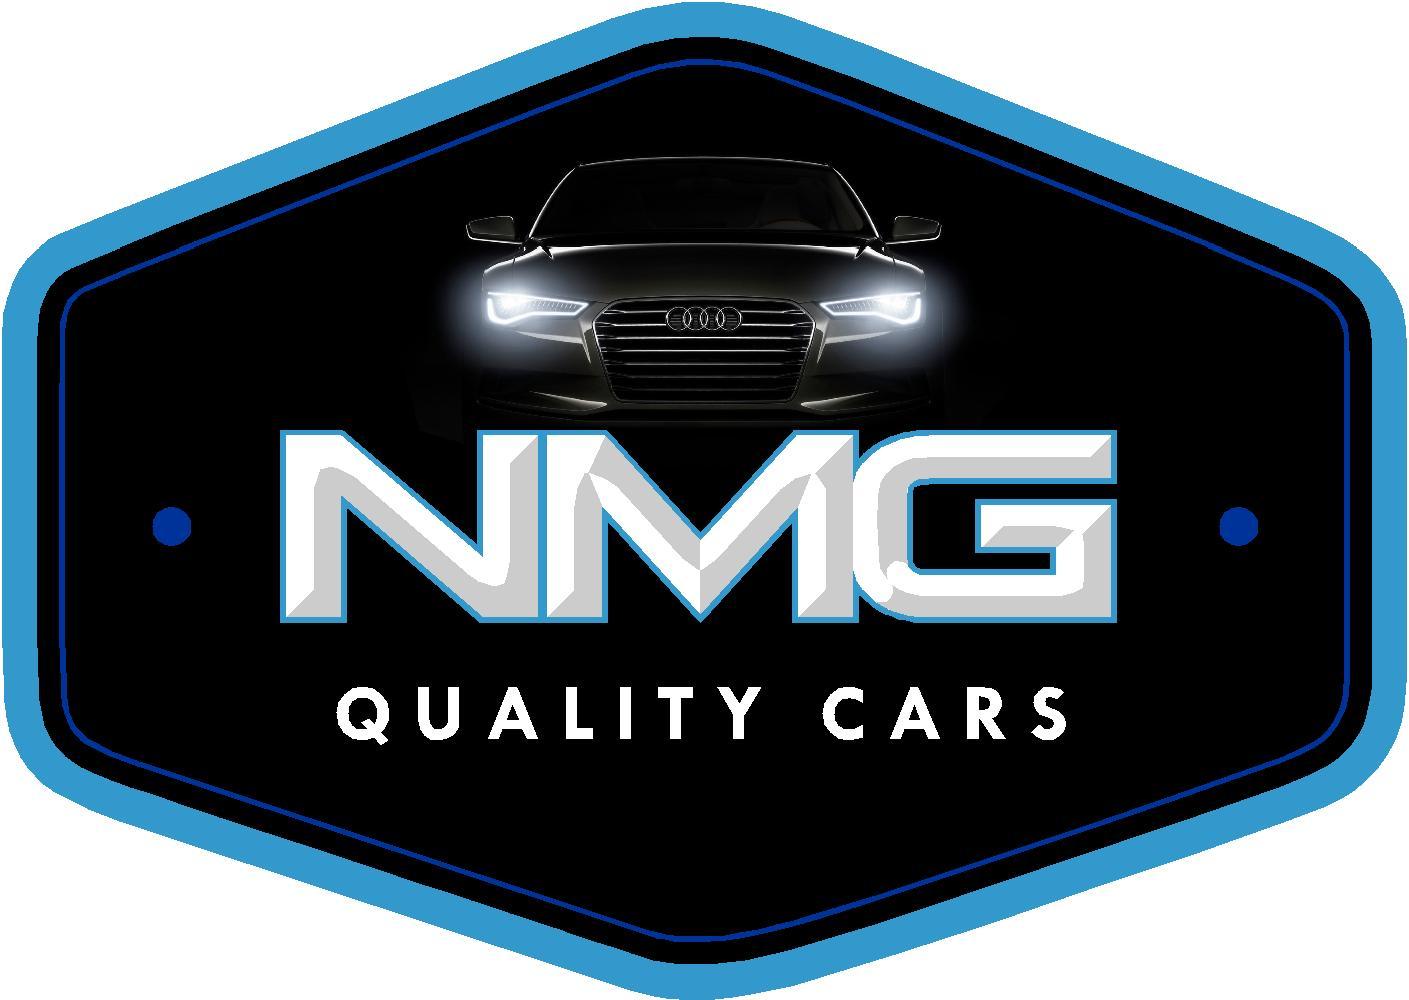 NMG Quality Cars, Strabane